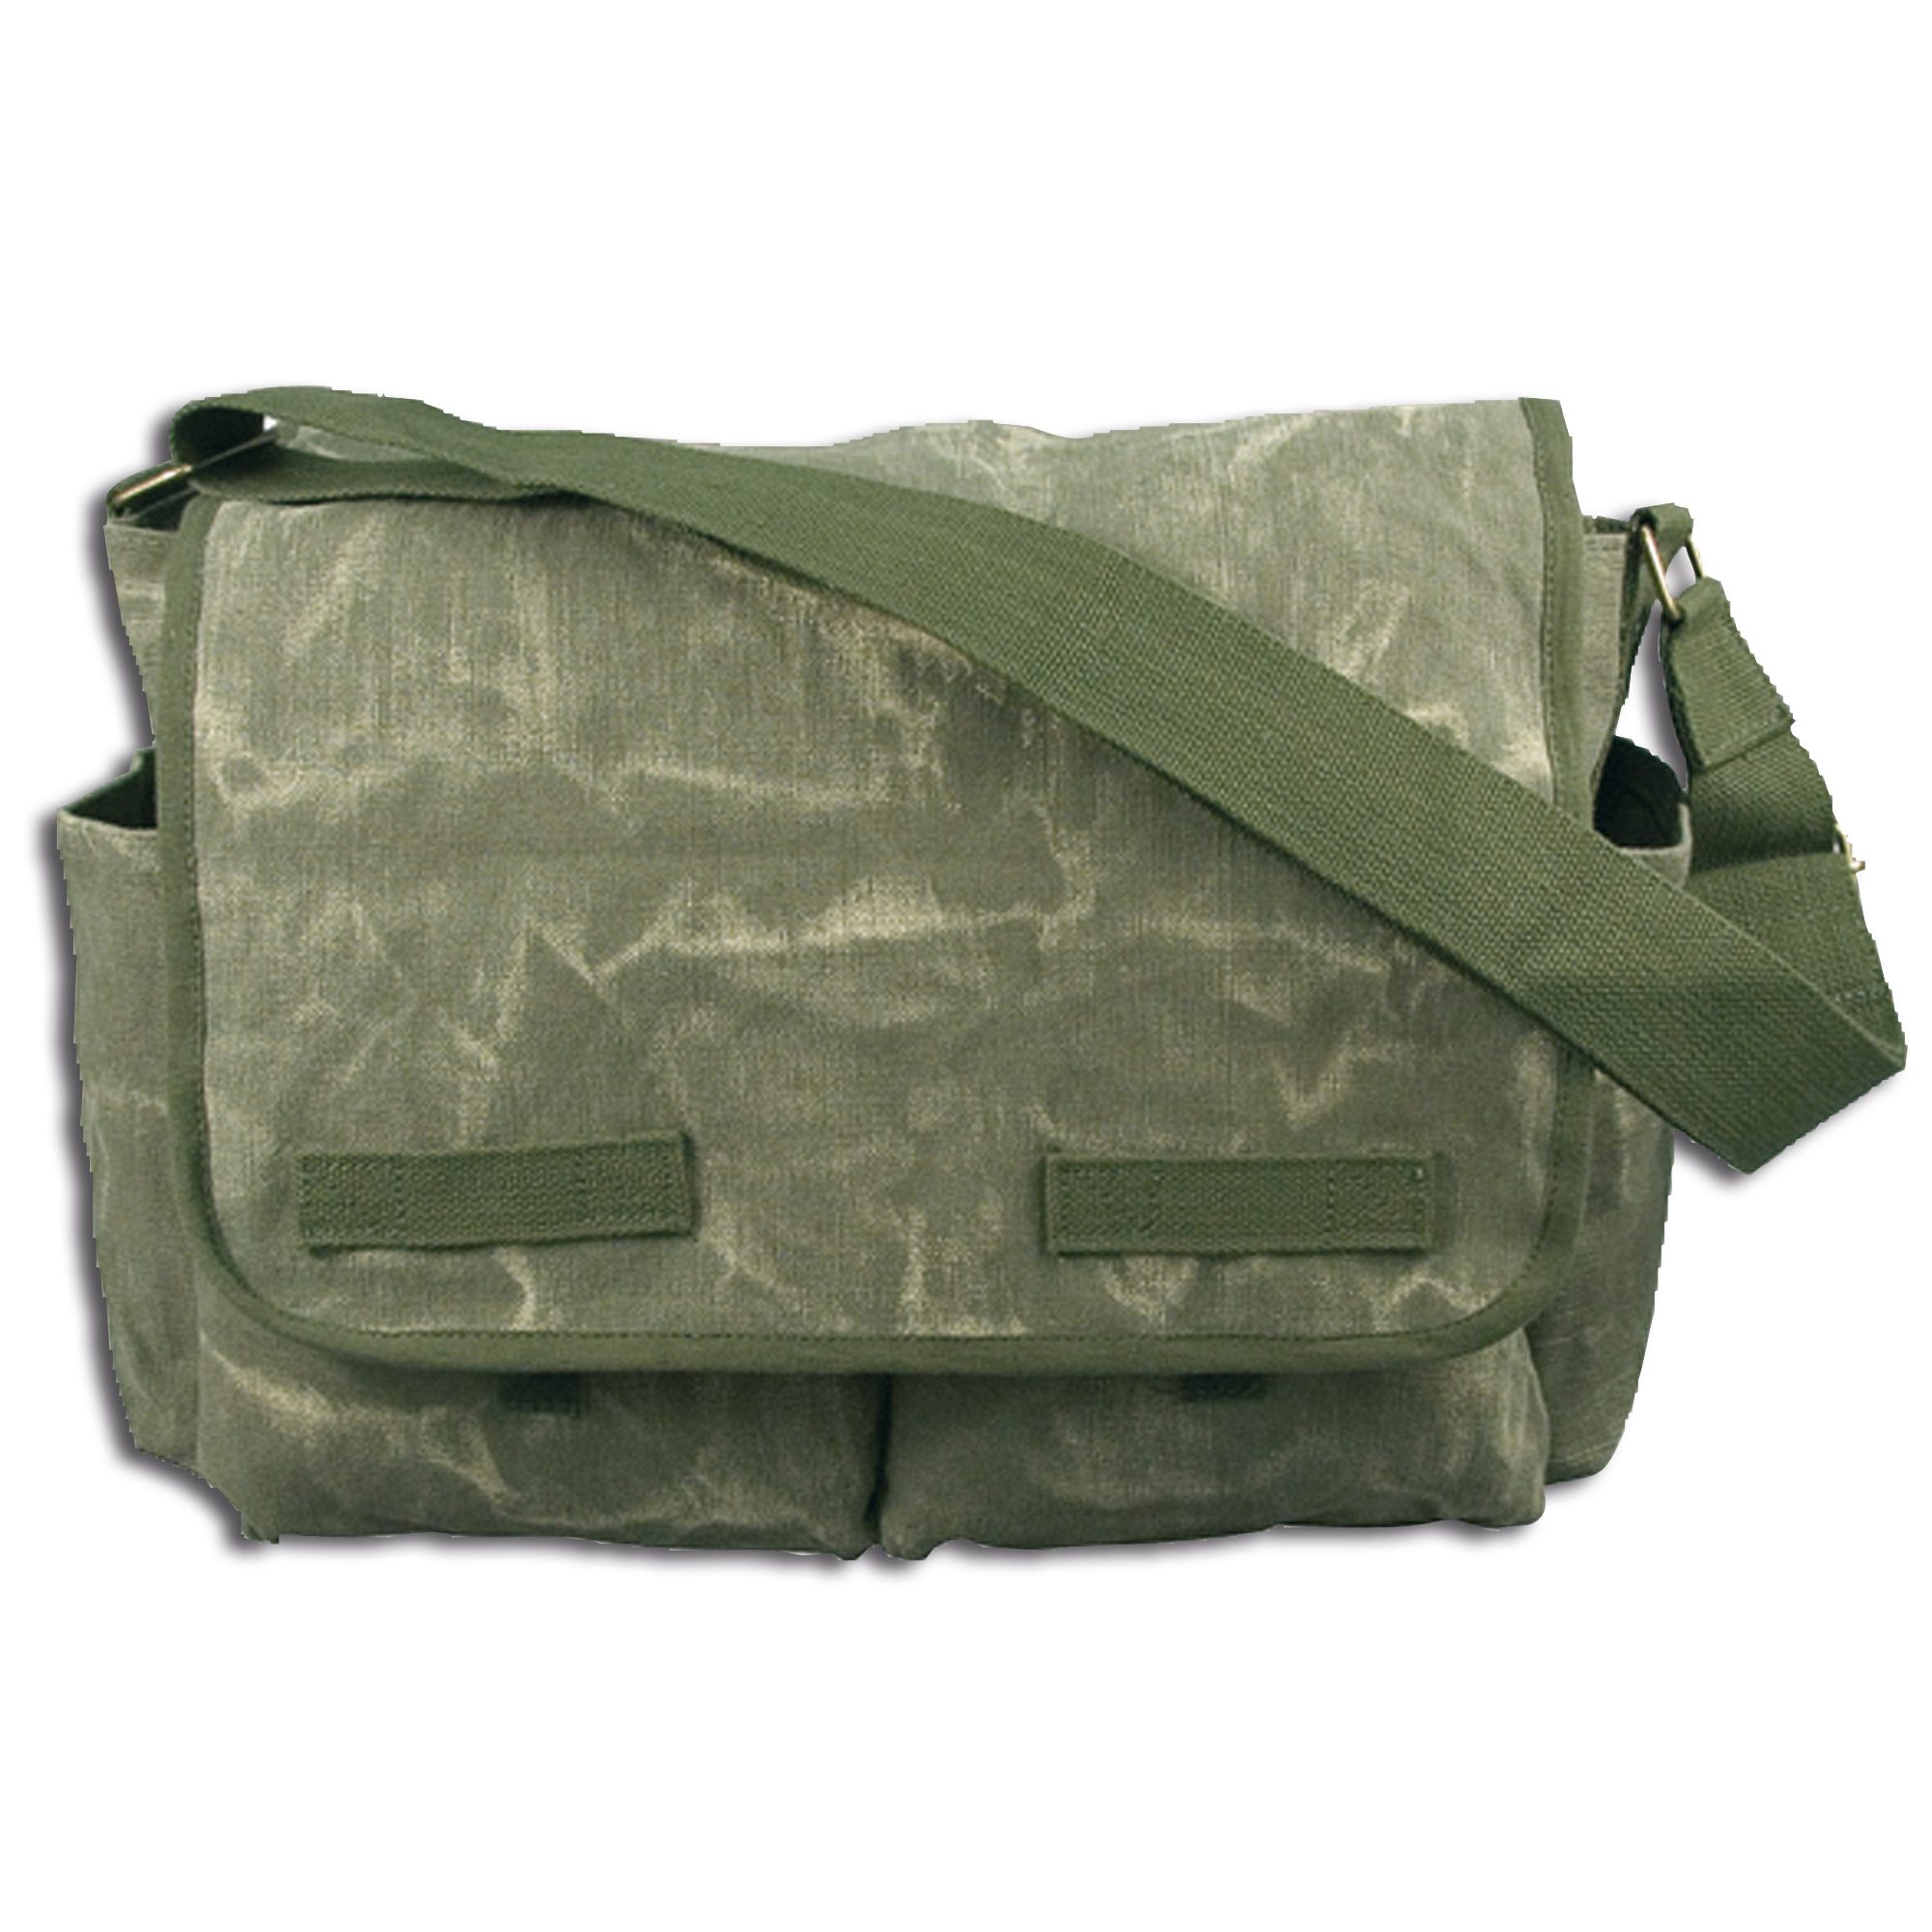 Messenger Canvas Bag Classic olive stonewashed